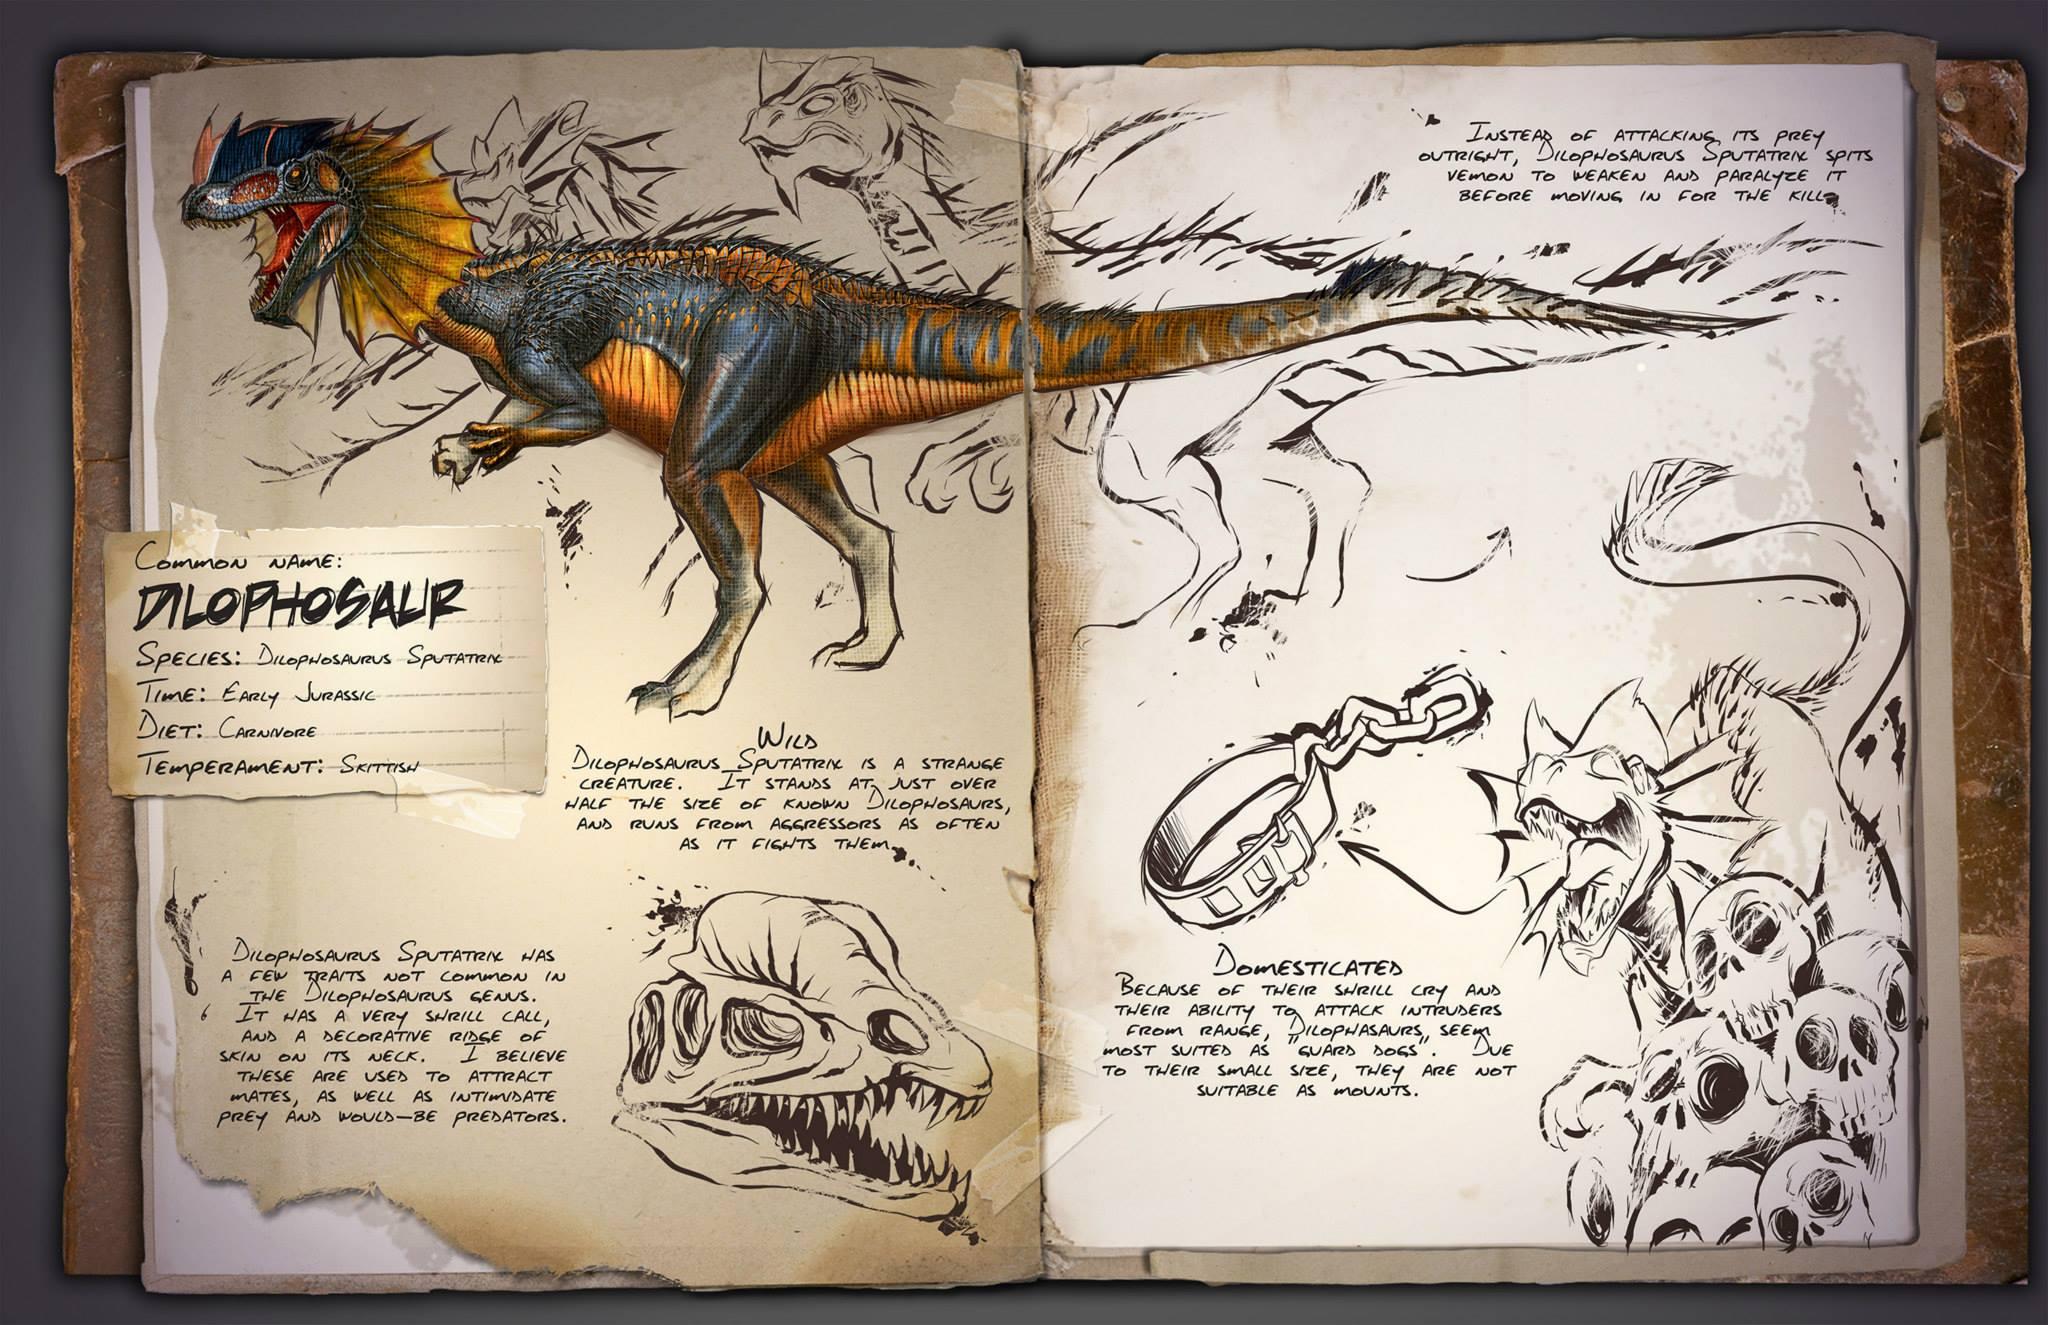 ark-survival-evolved-1-555dc0807f50c.jpe